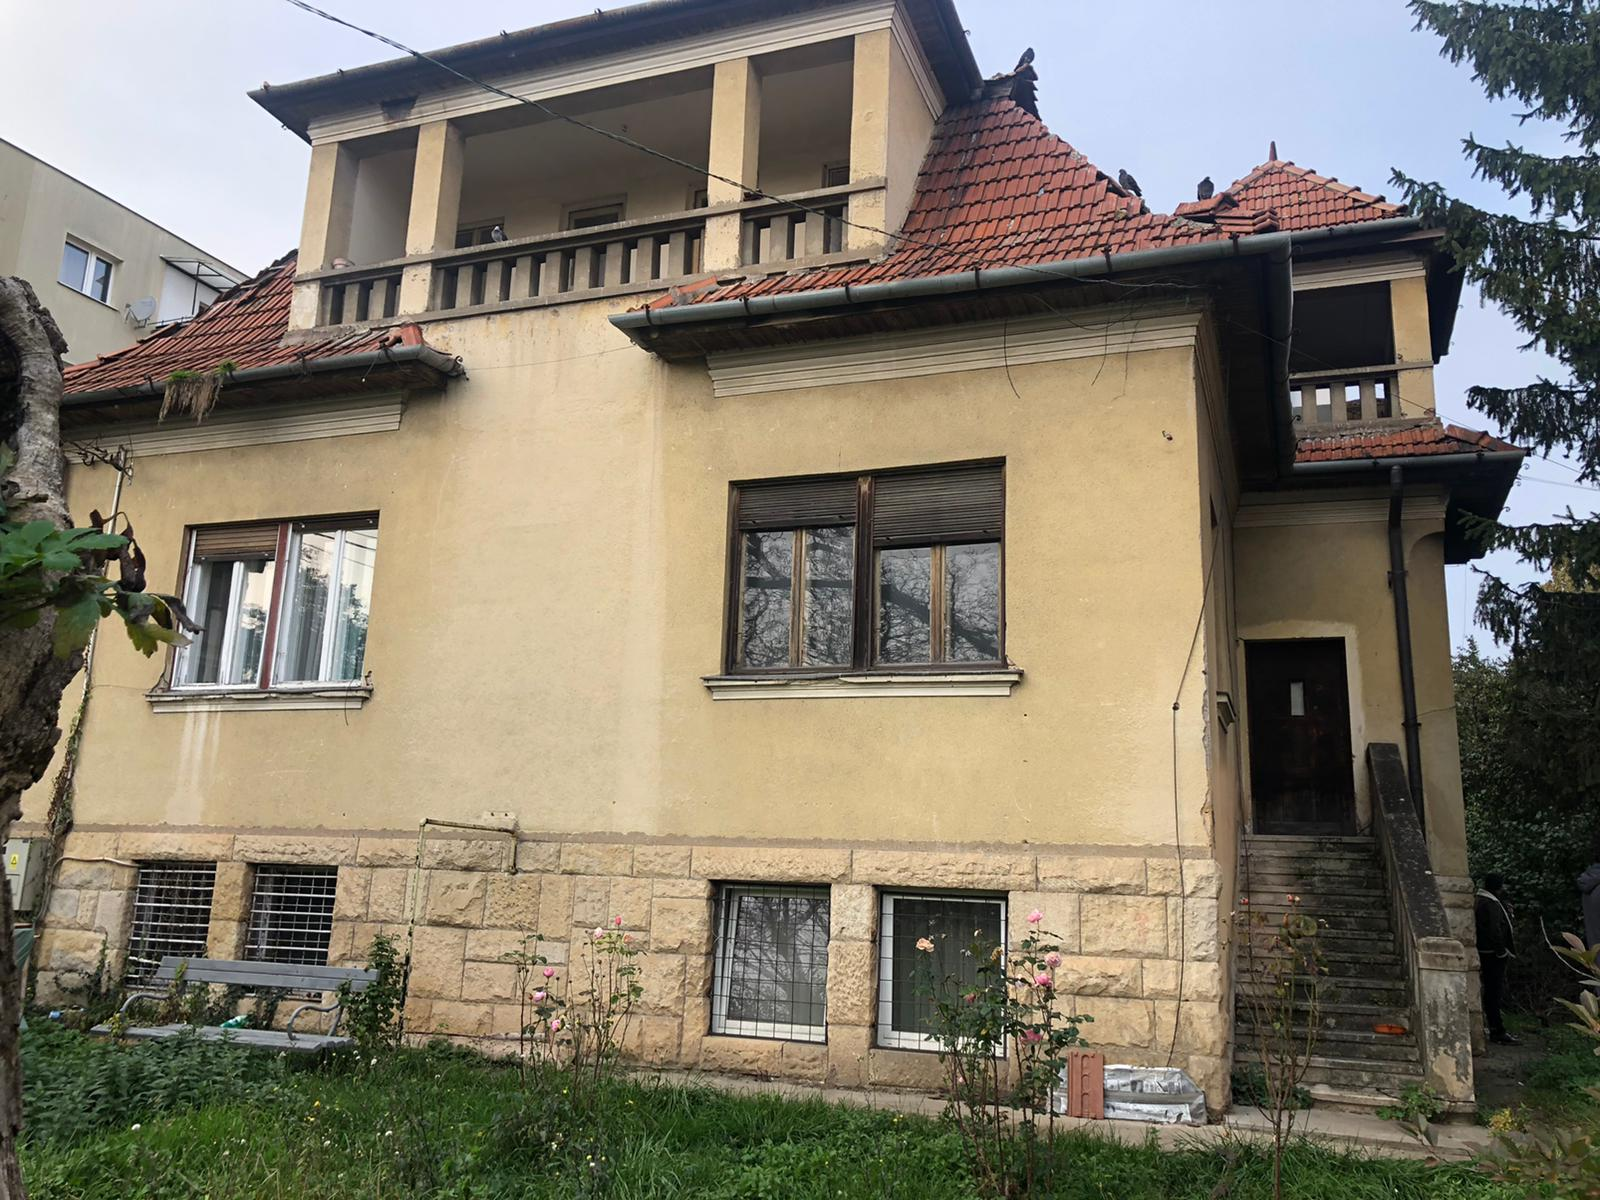 187997-Vanzare apartament in casa, Grigorescu, Cluj-Napoca